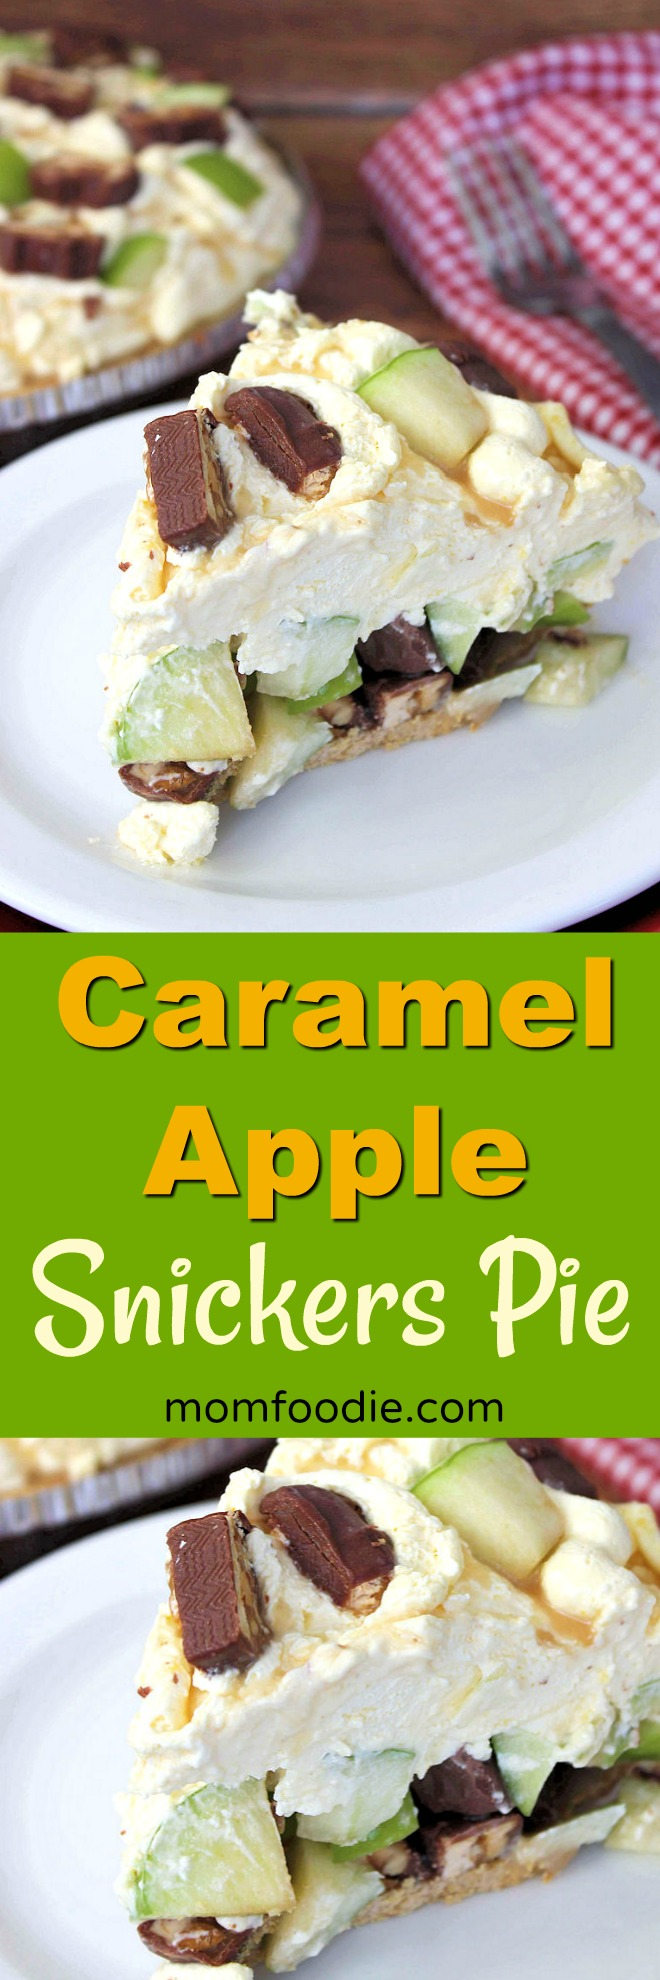 Caramel Apple Snickers Pie